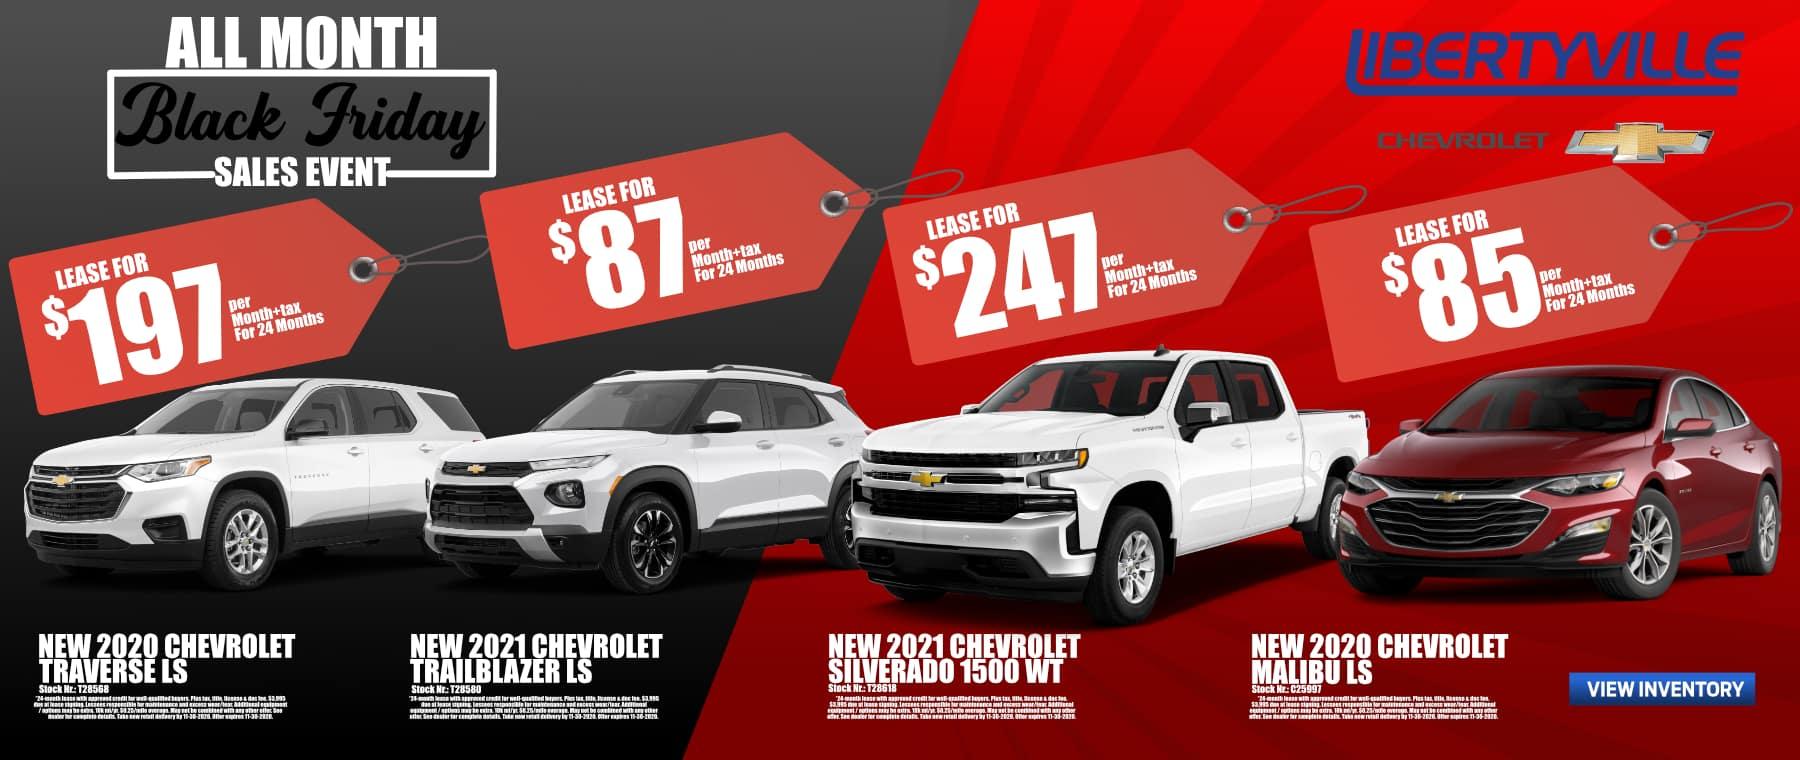 November-2020_Lease_Specials_Libertyville Chevrolet